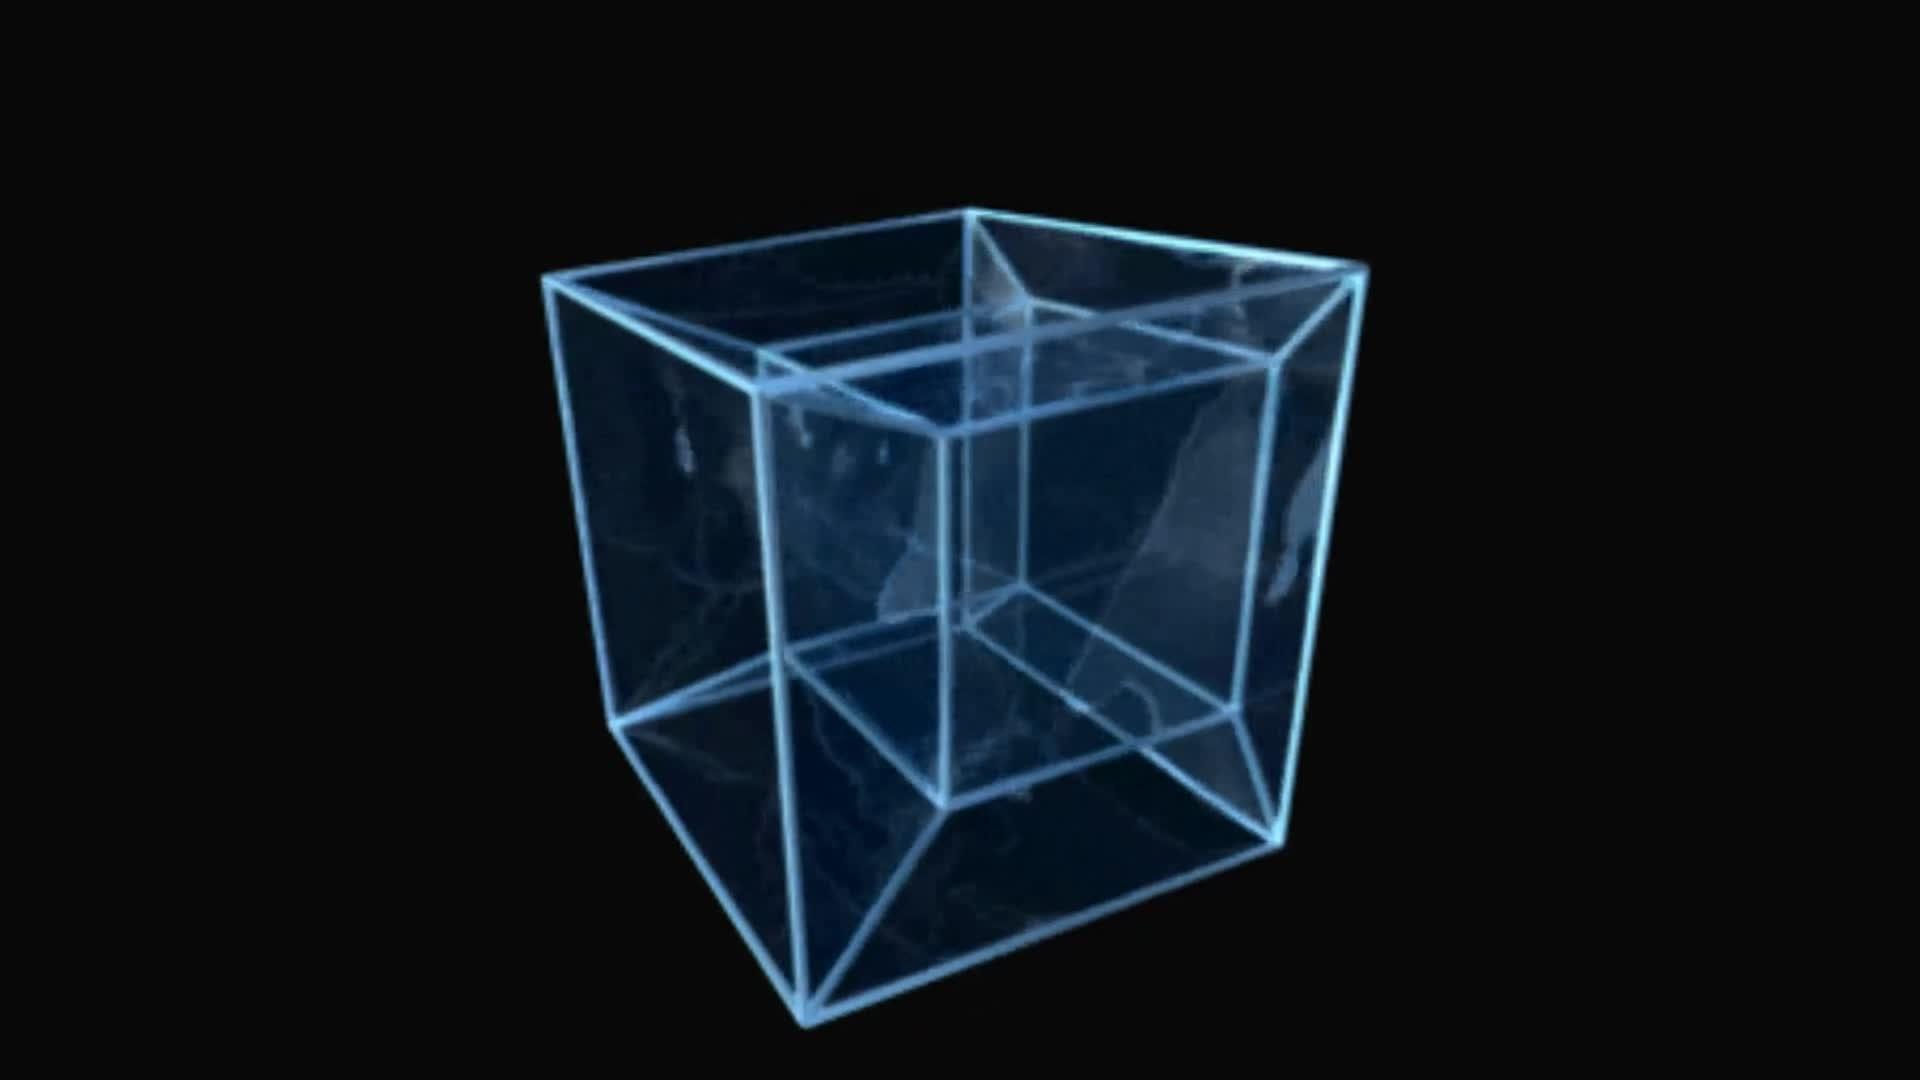 File:Animation of a tesseract.webm